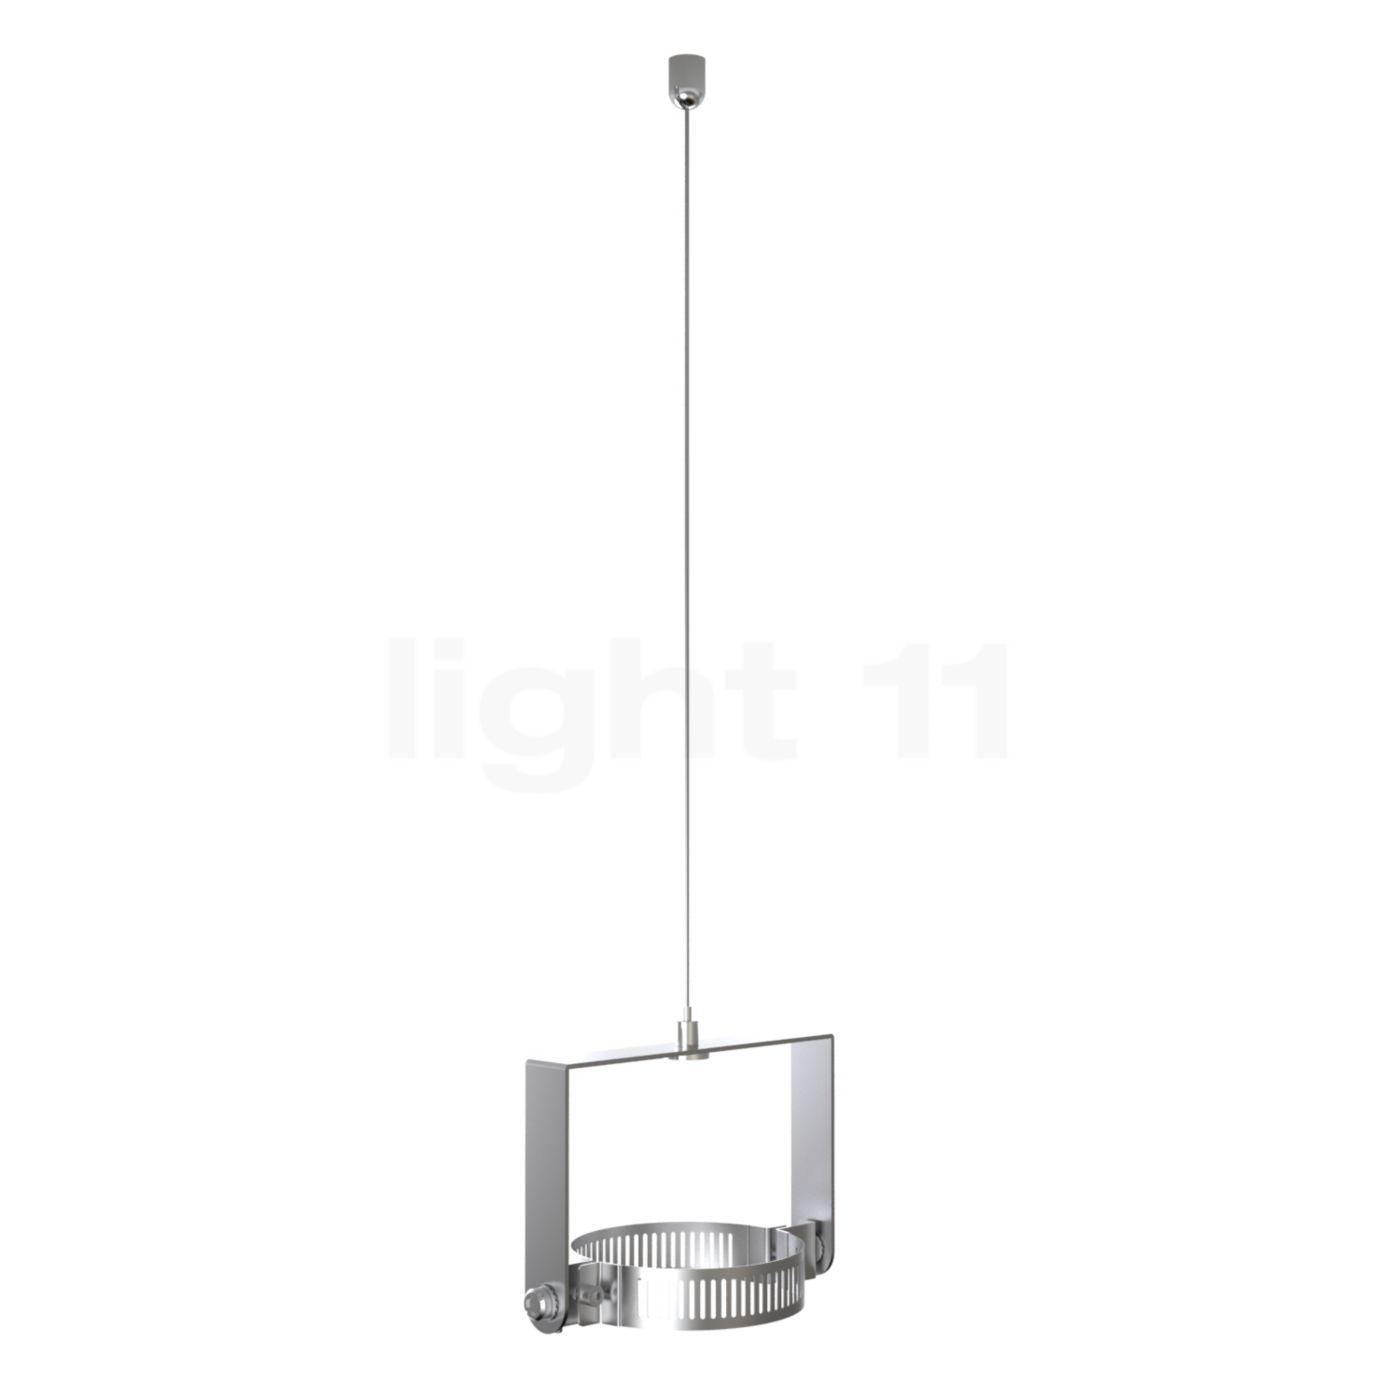 DCW Vertikale Aufhängung für In The Tube 100, Aluminium ITT HANG 1 - 100